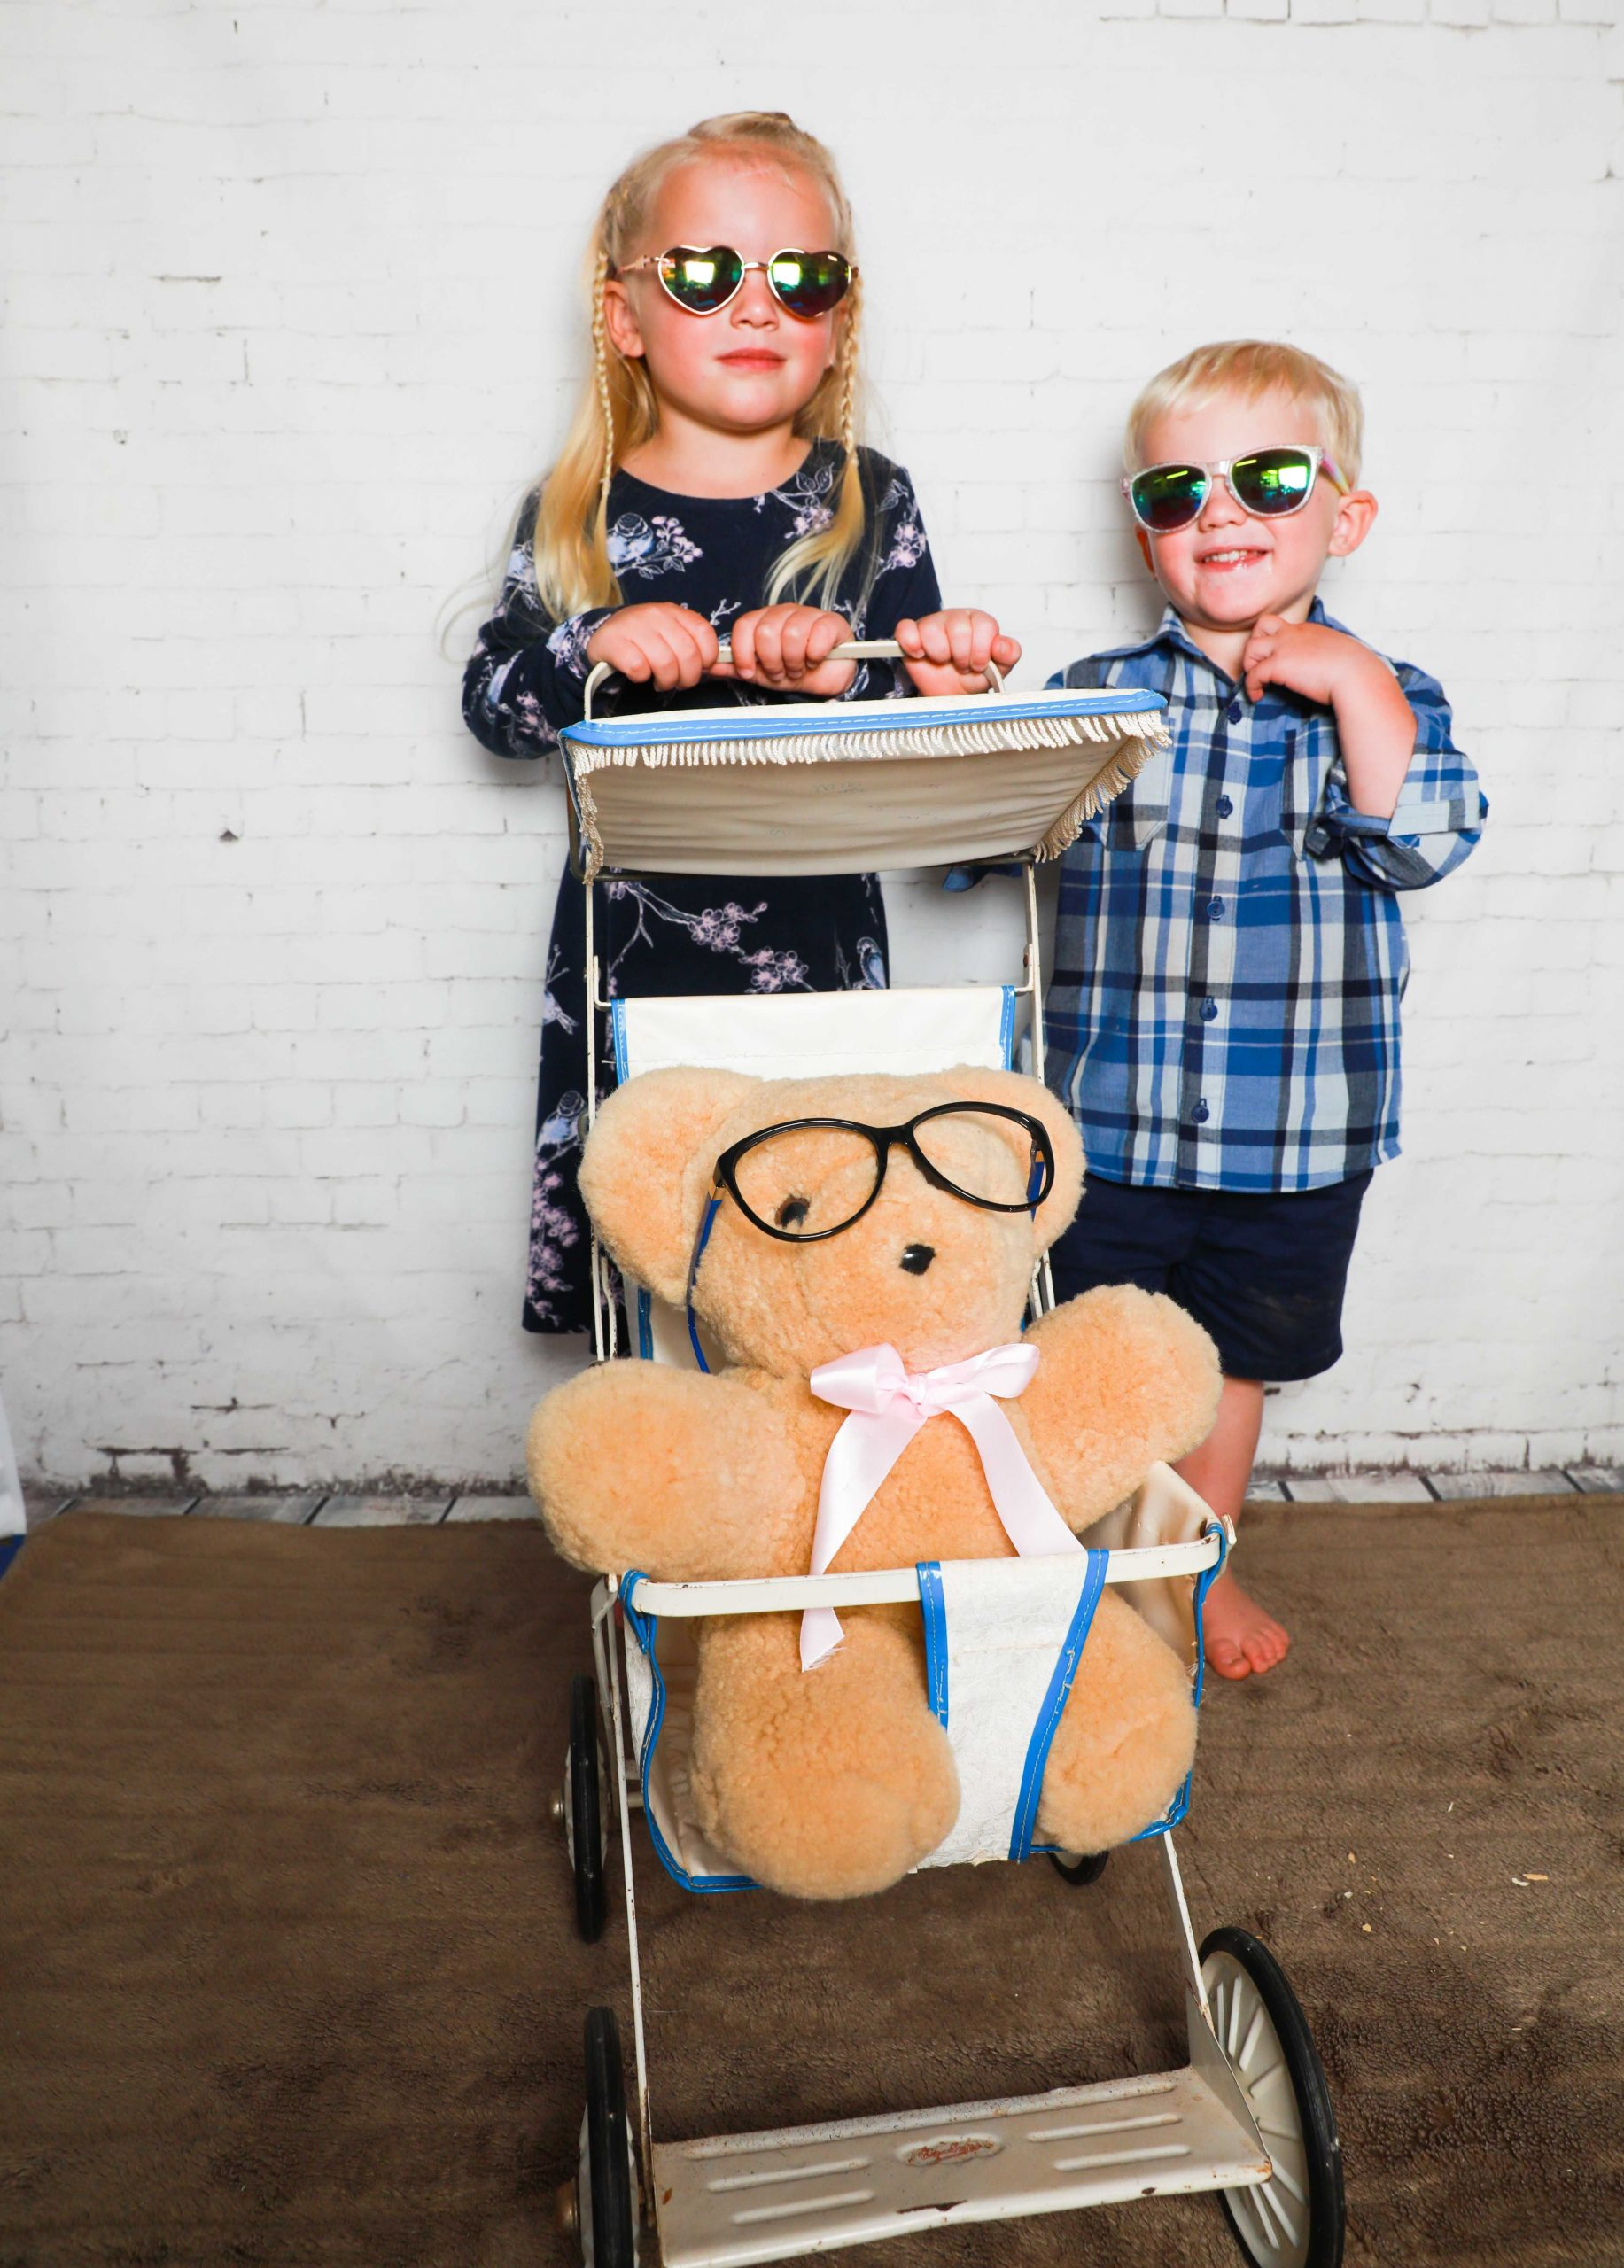 Very cool teddy bears